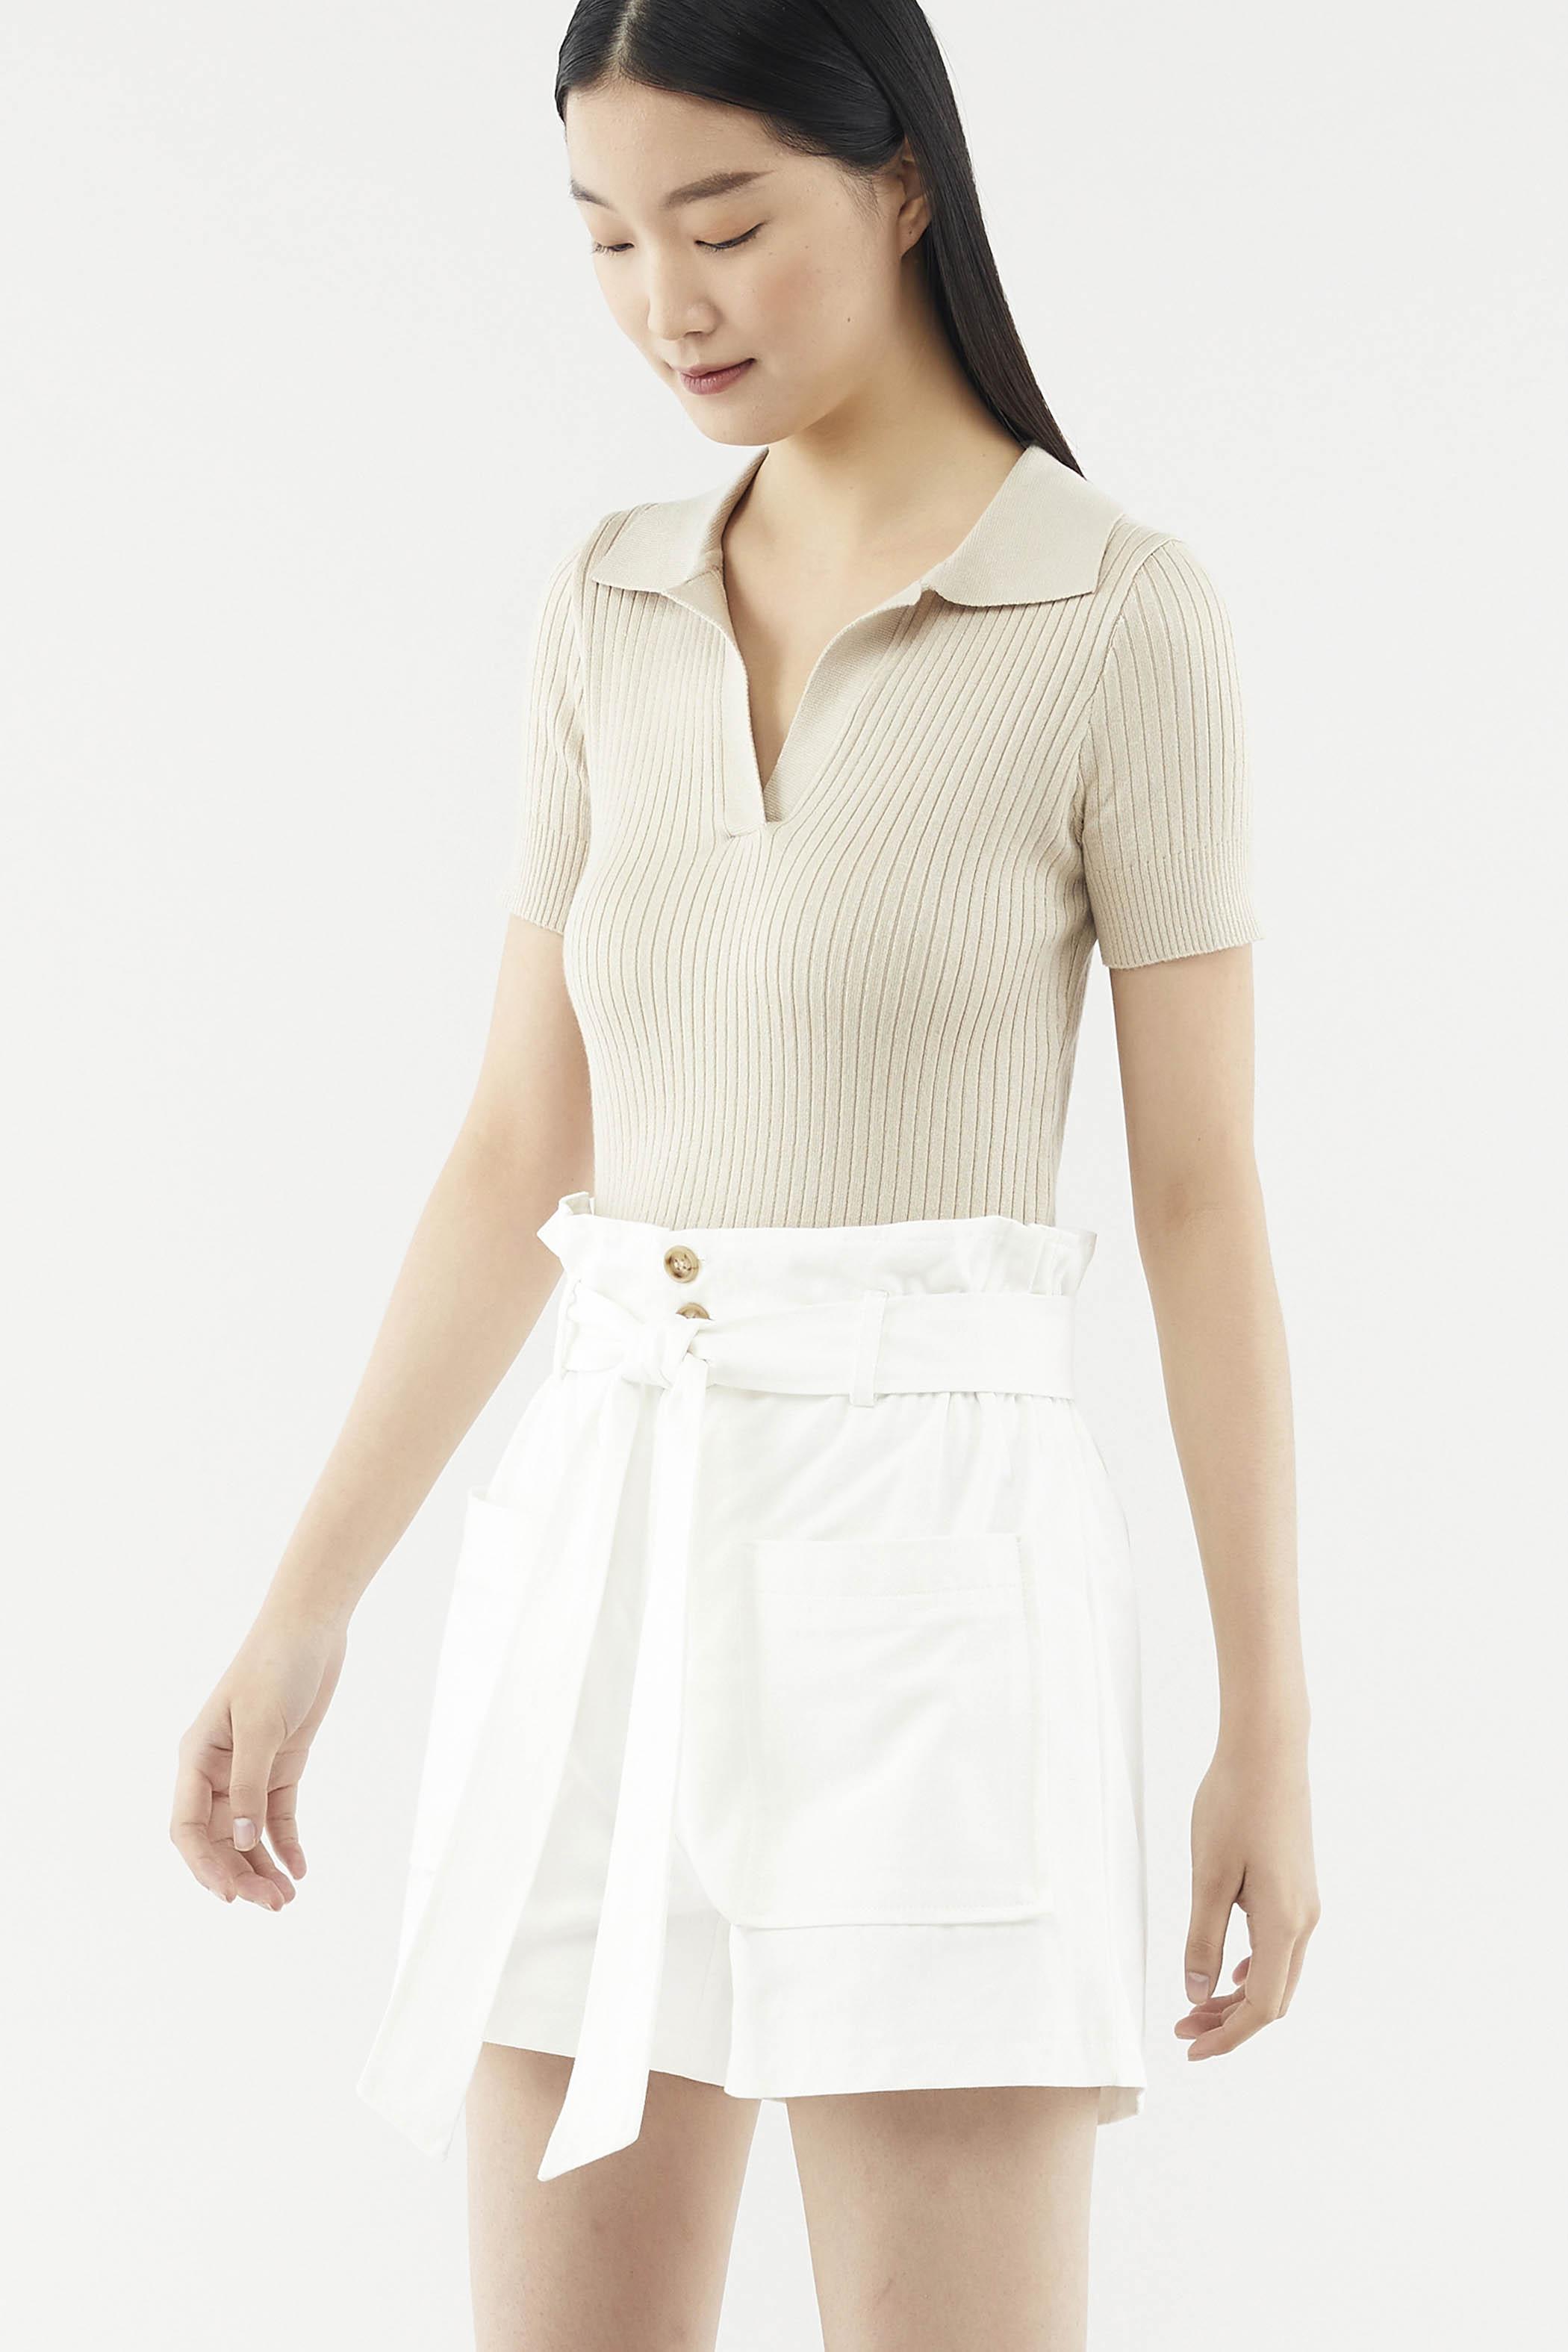 Jemira Collared Knit Top